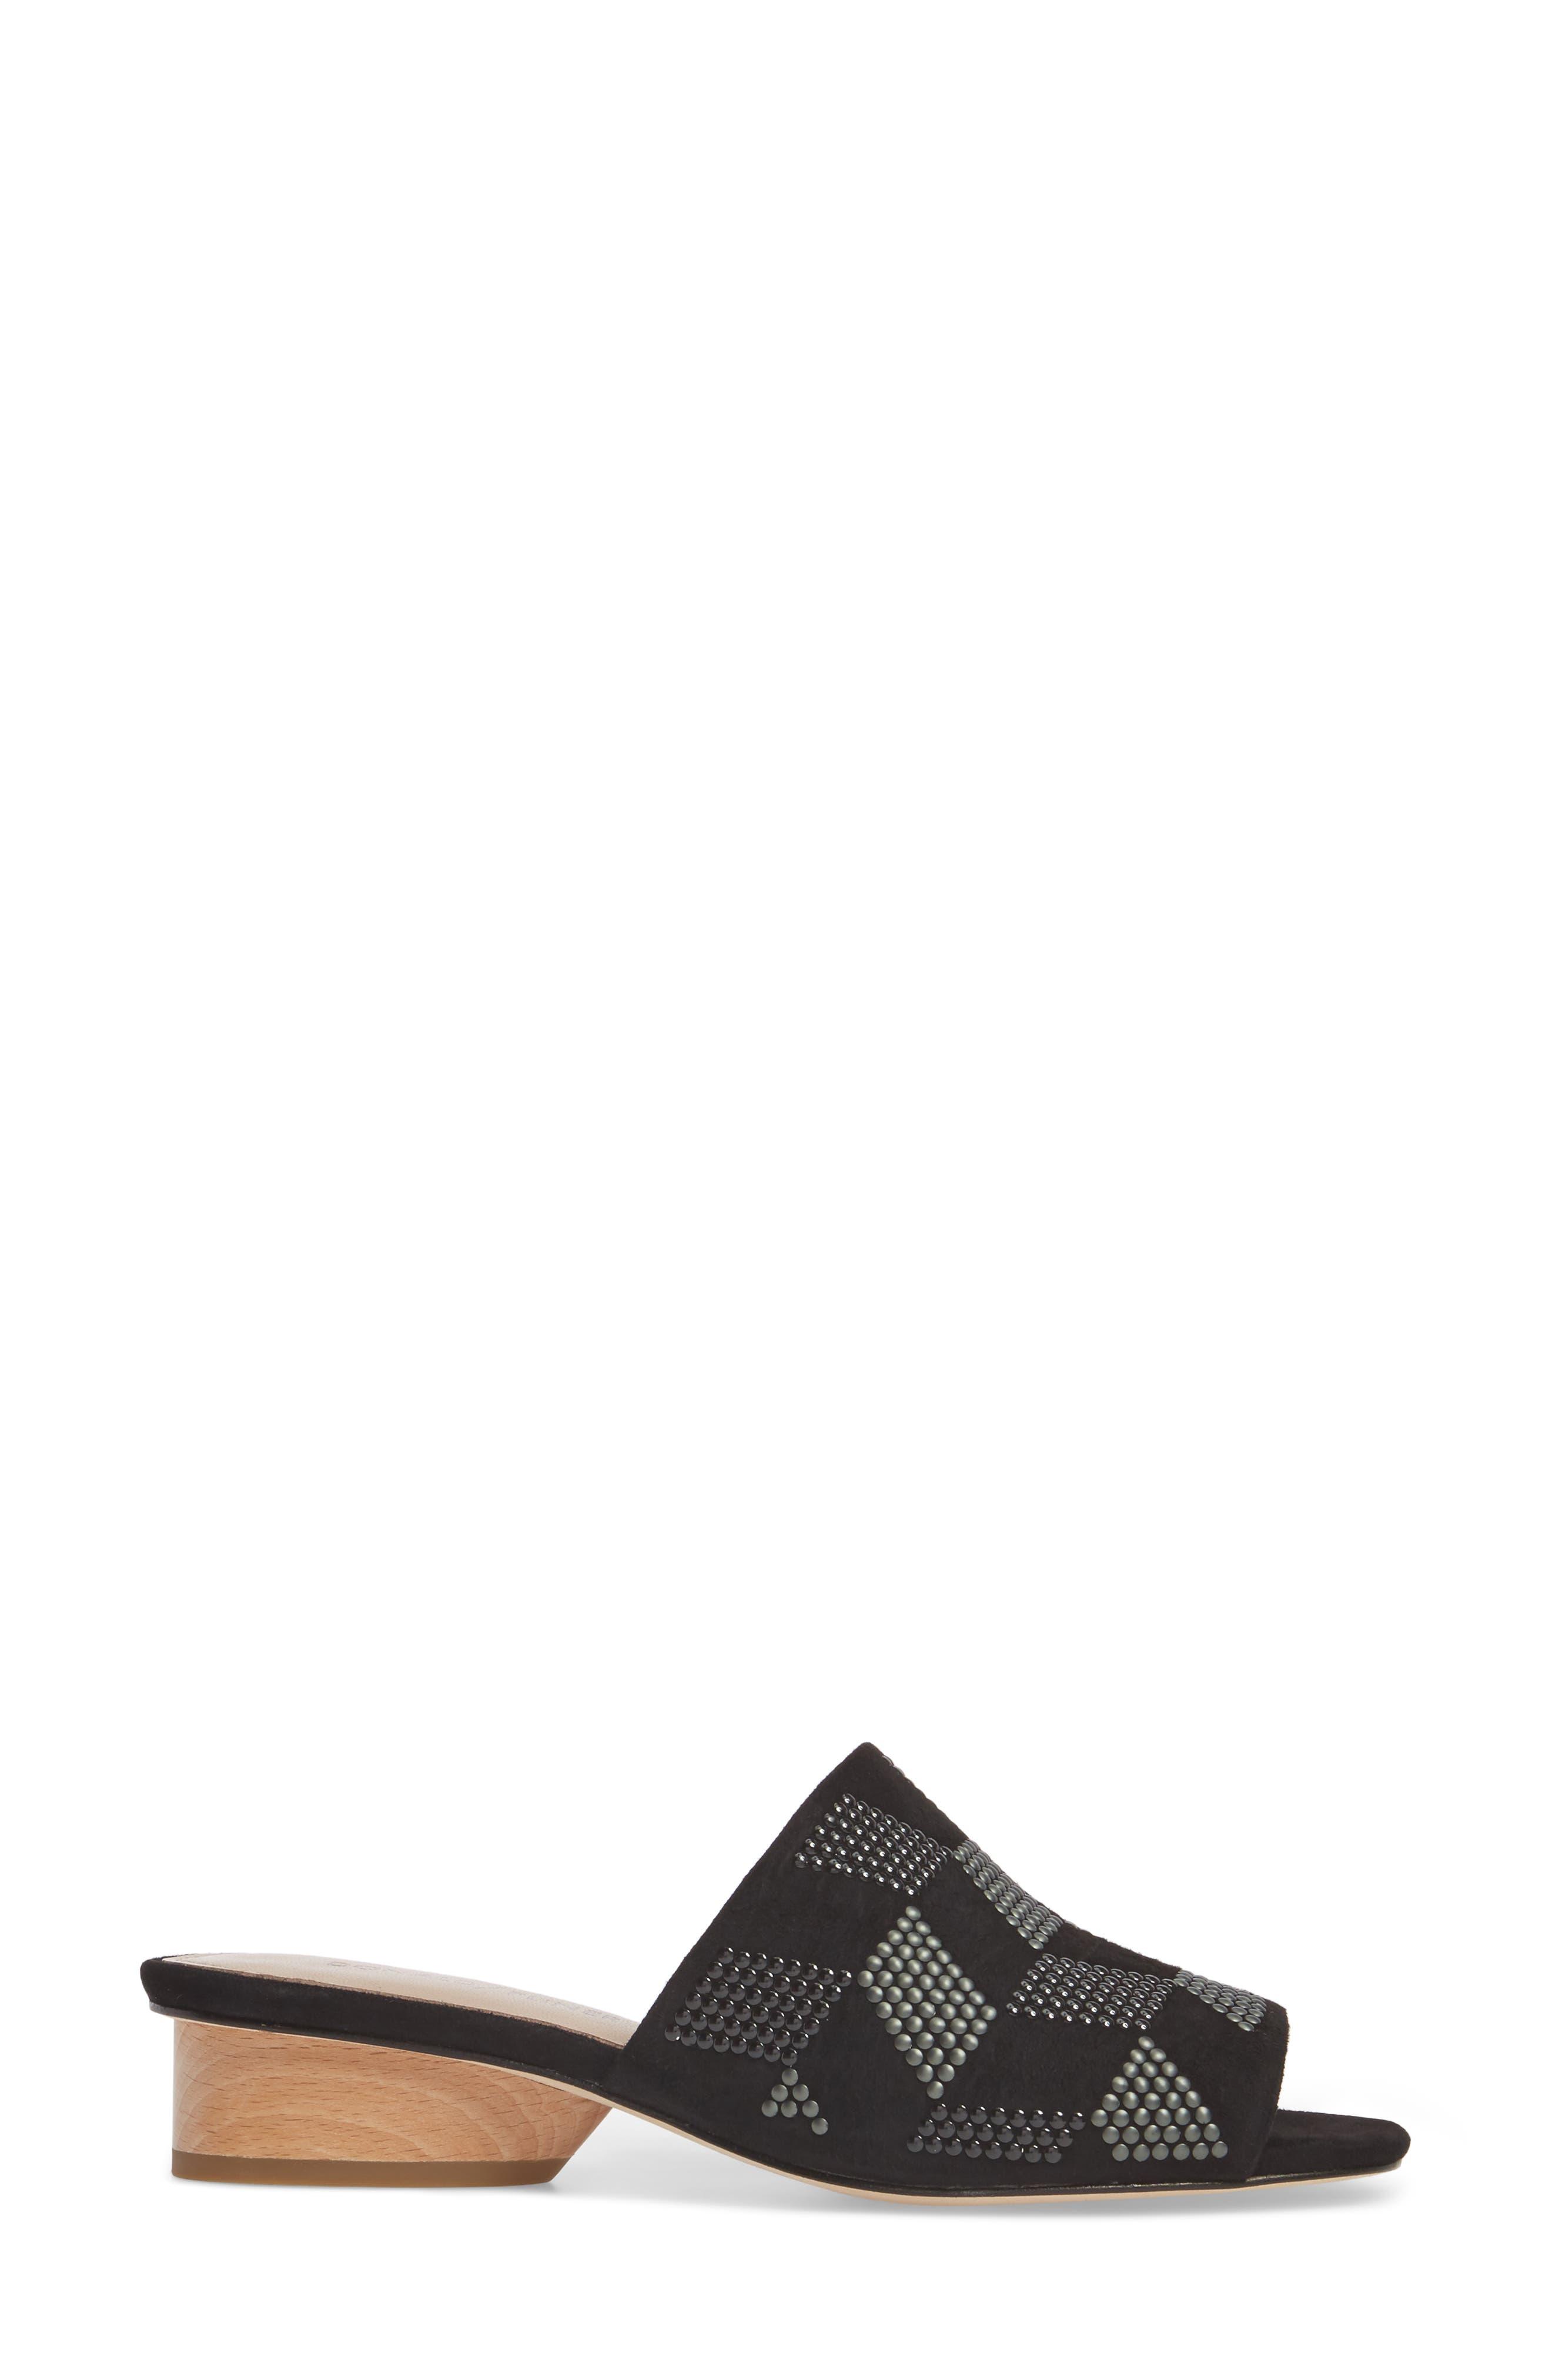 Rimini Slide Sandal,                             Alternate thumbnail 3, color,                             Black Suede